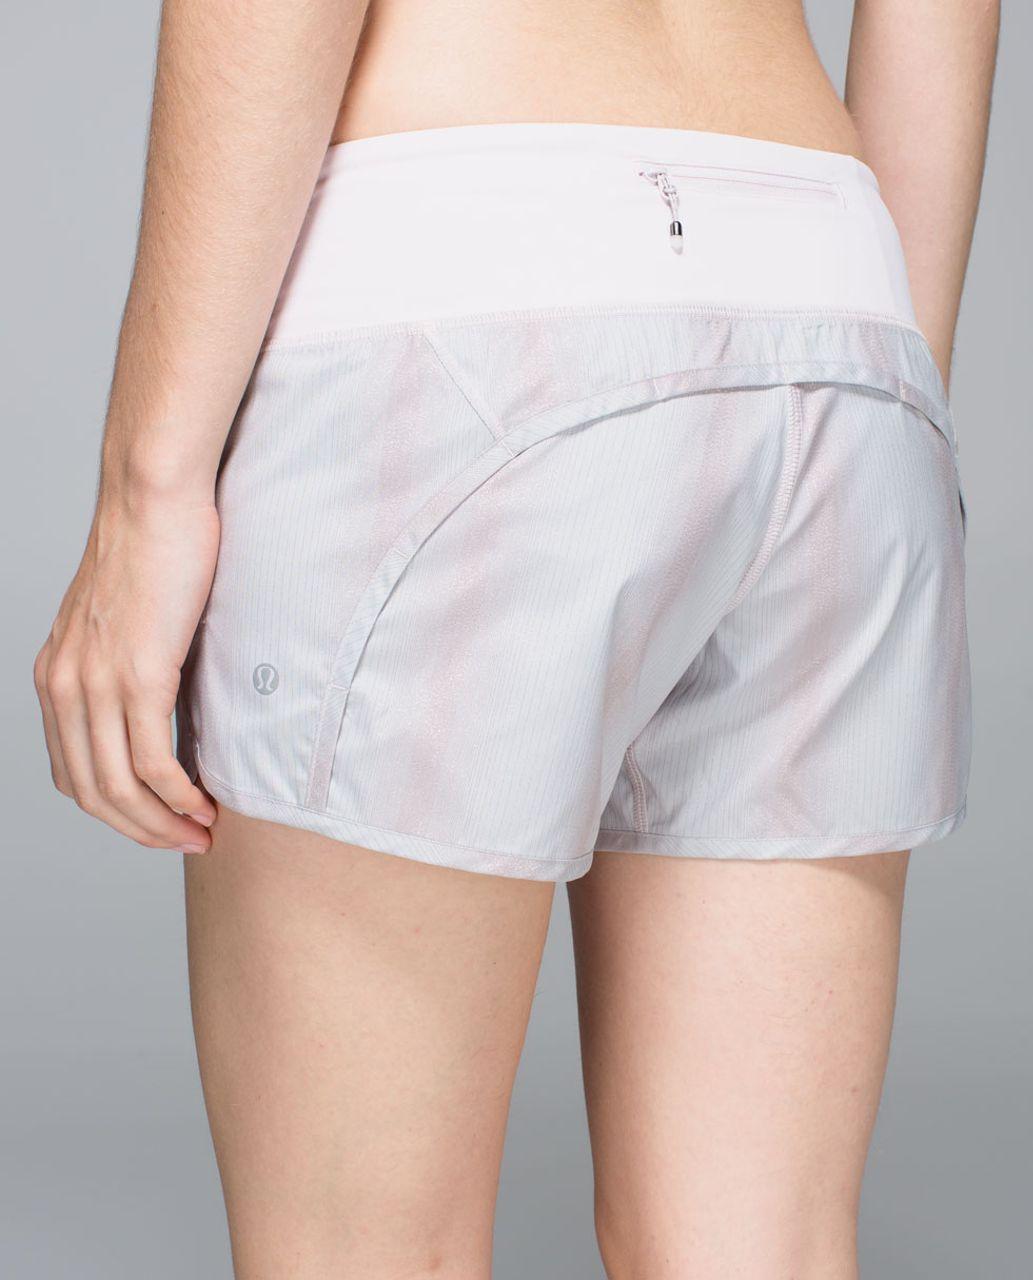 Lululemon Run Times Short *2-way Stretch - Sparkle Swift Heathered Silver Spoon Neutral Blush / Neutral Blush